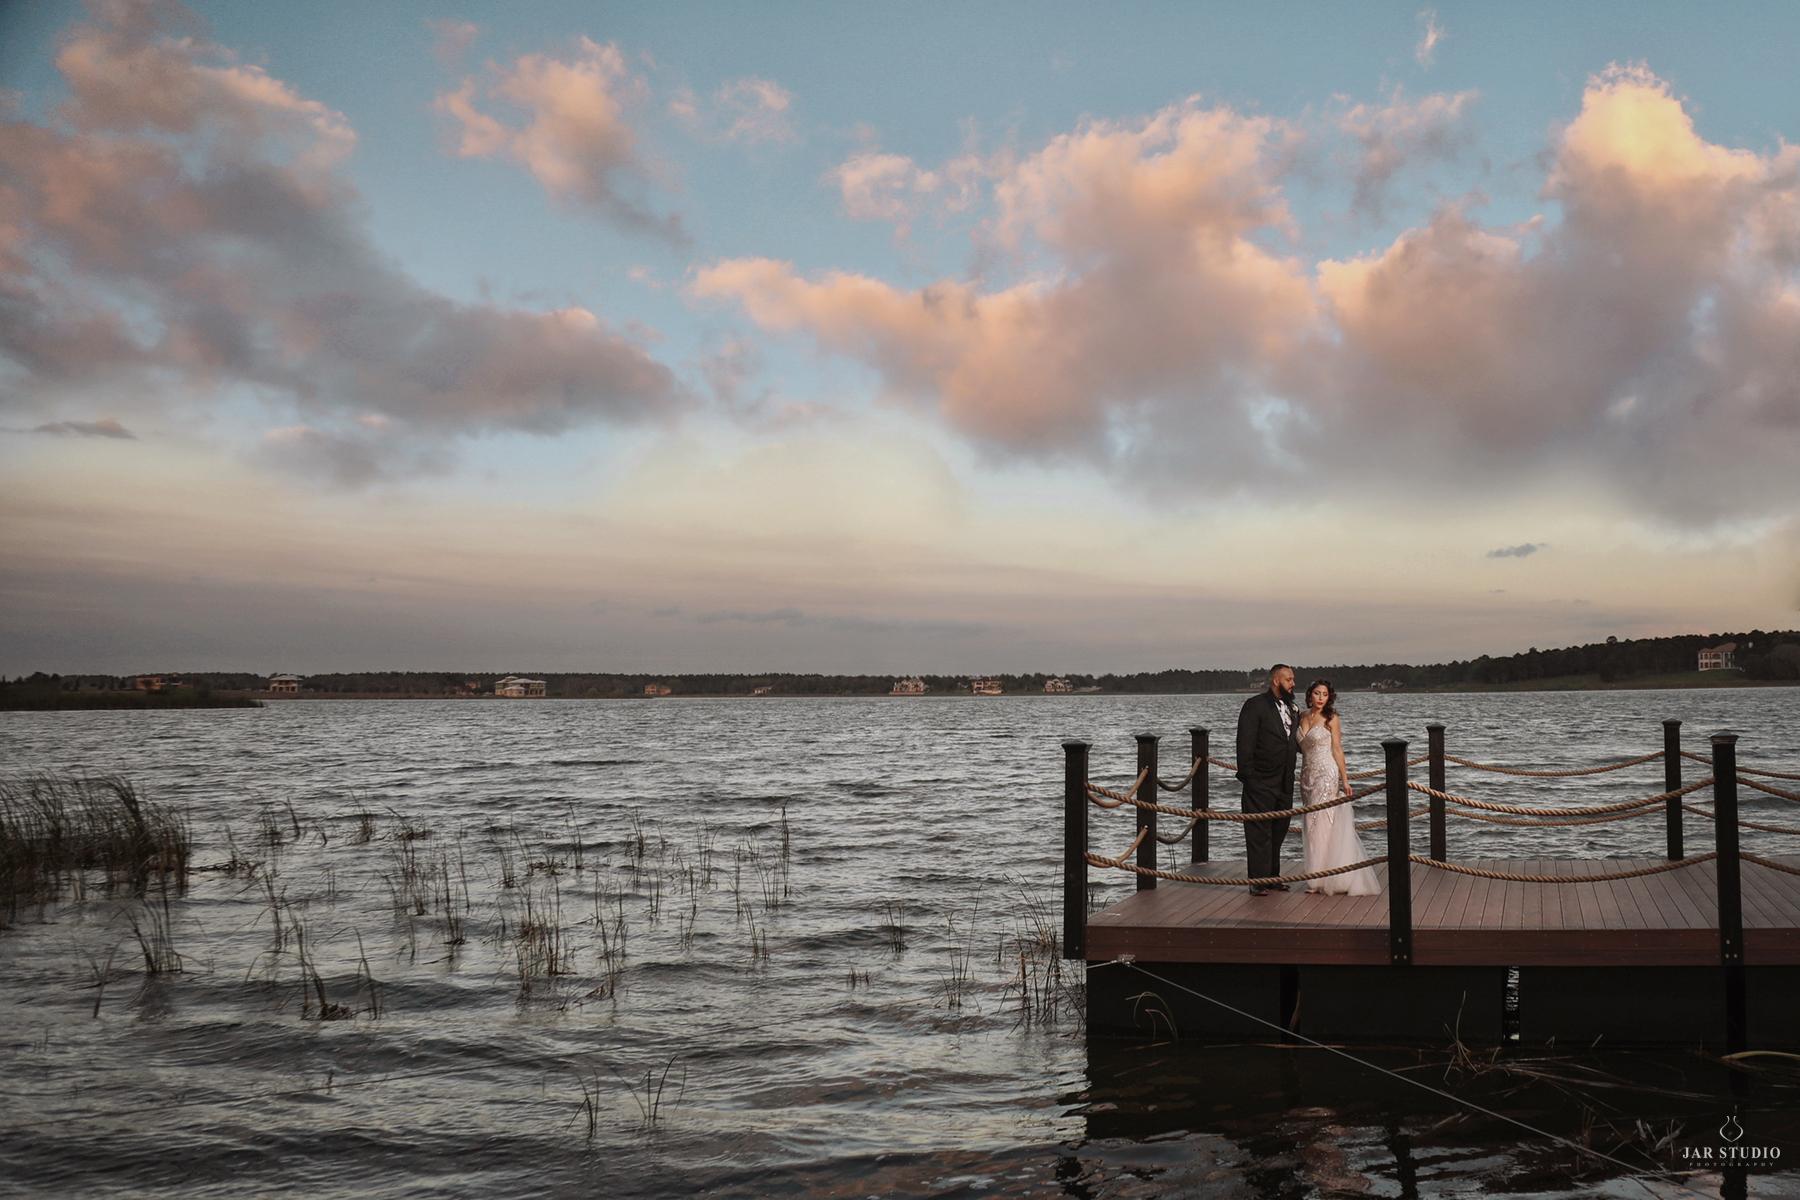 25-new-beautiful-wedding-venue-jarstudio.jpg